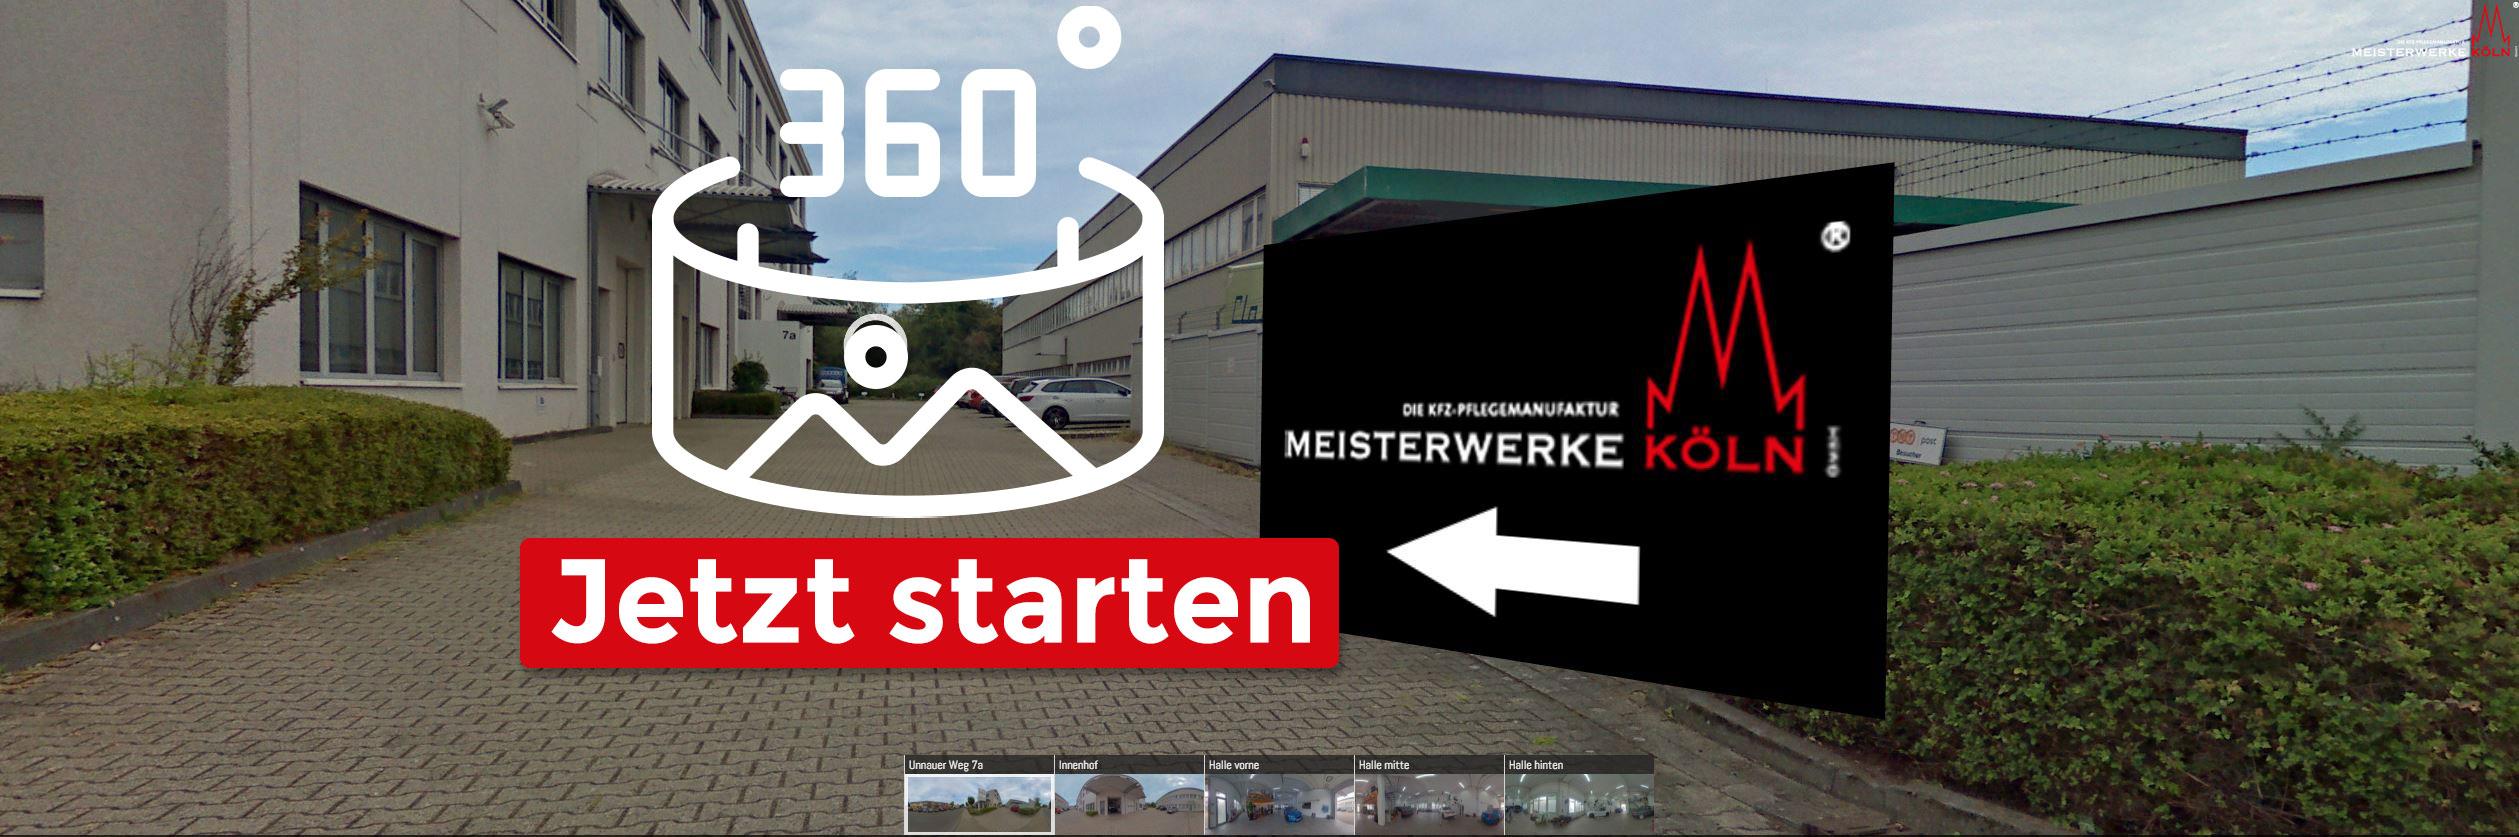 Meisterwerke Köln Kontakt VR